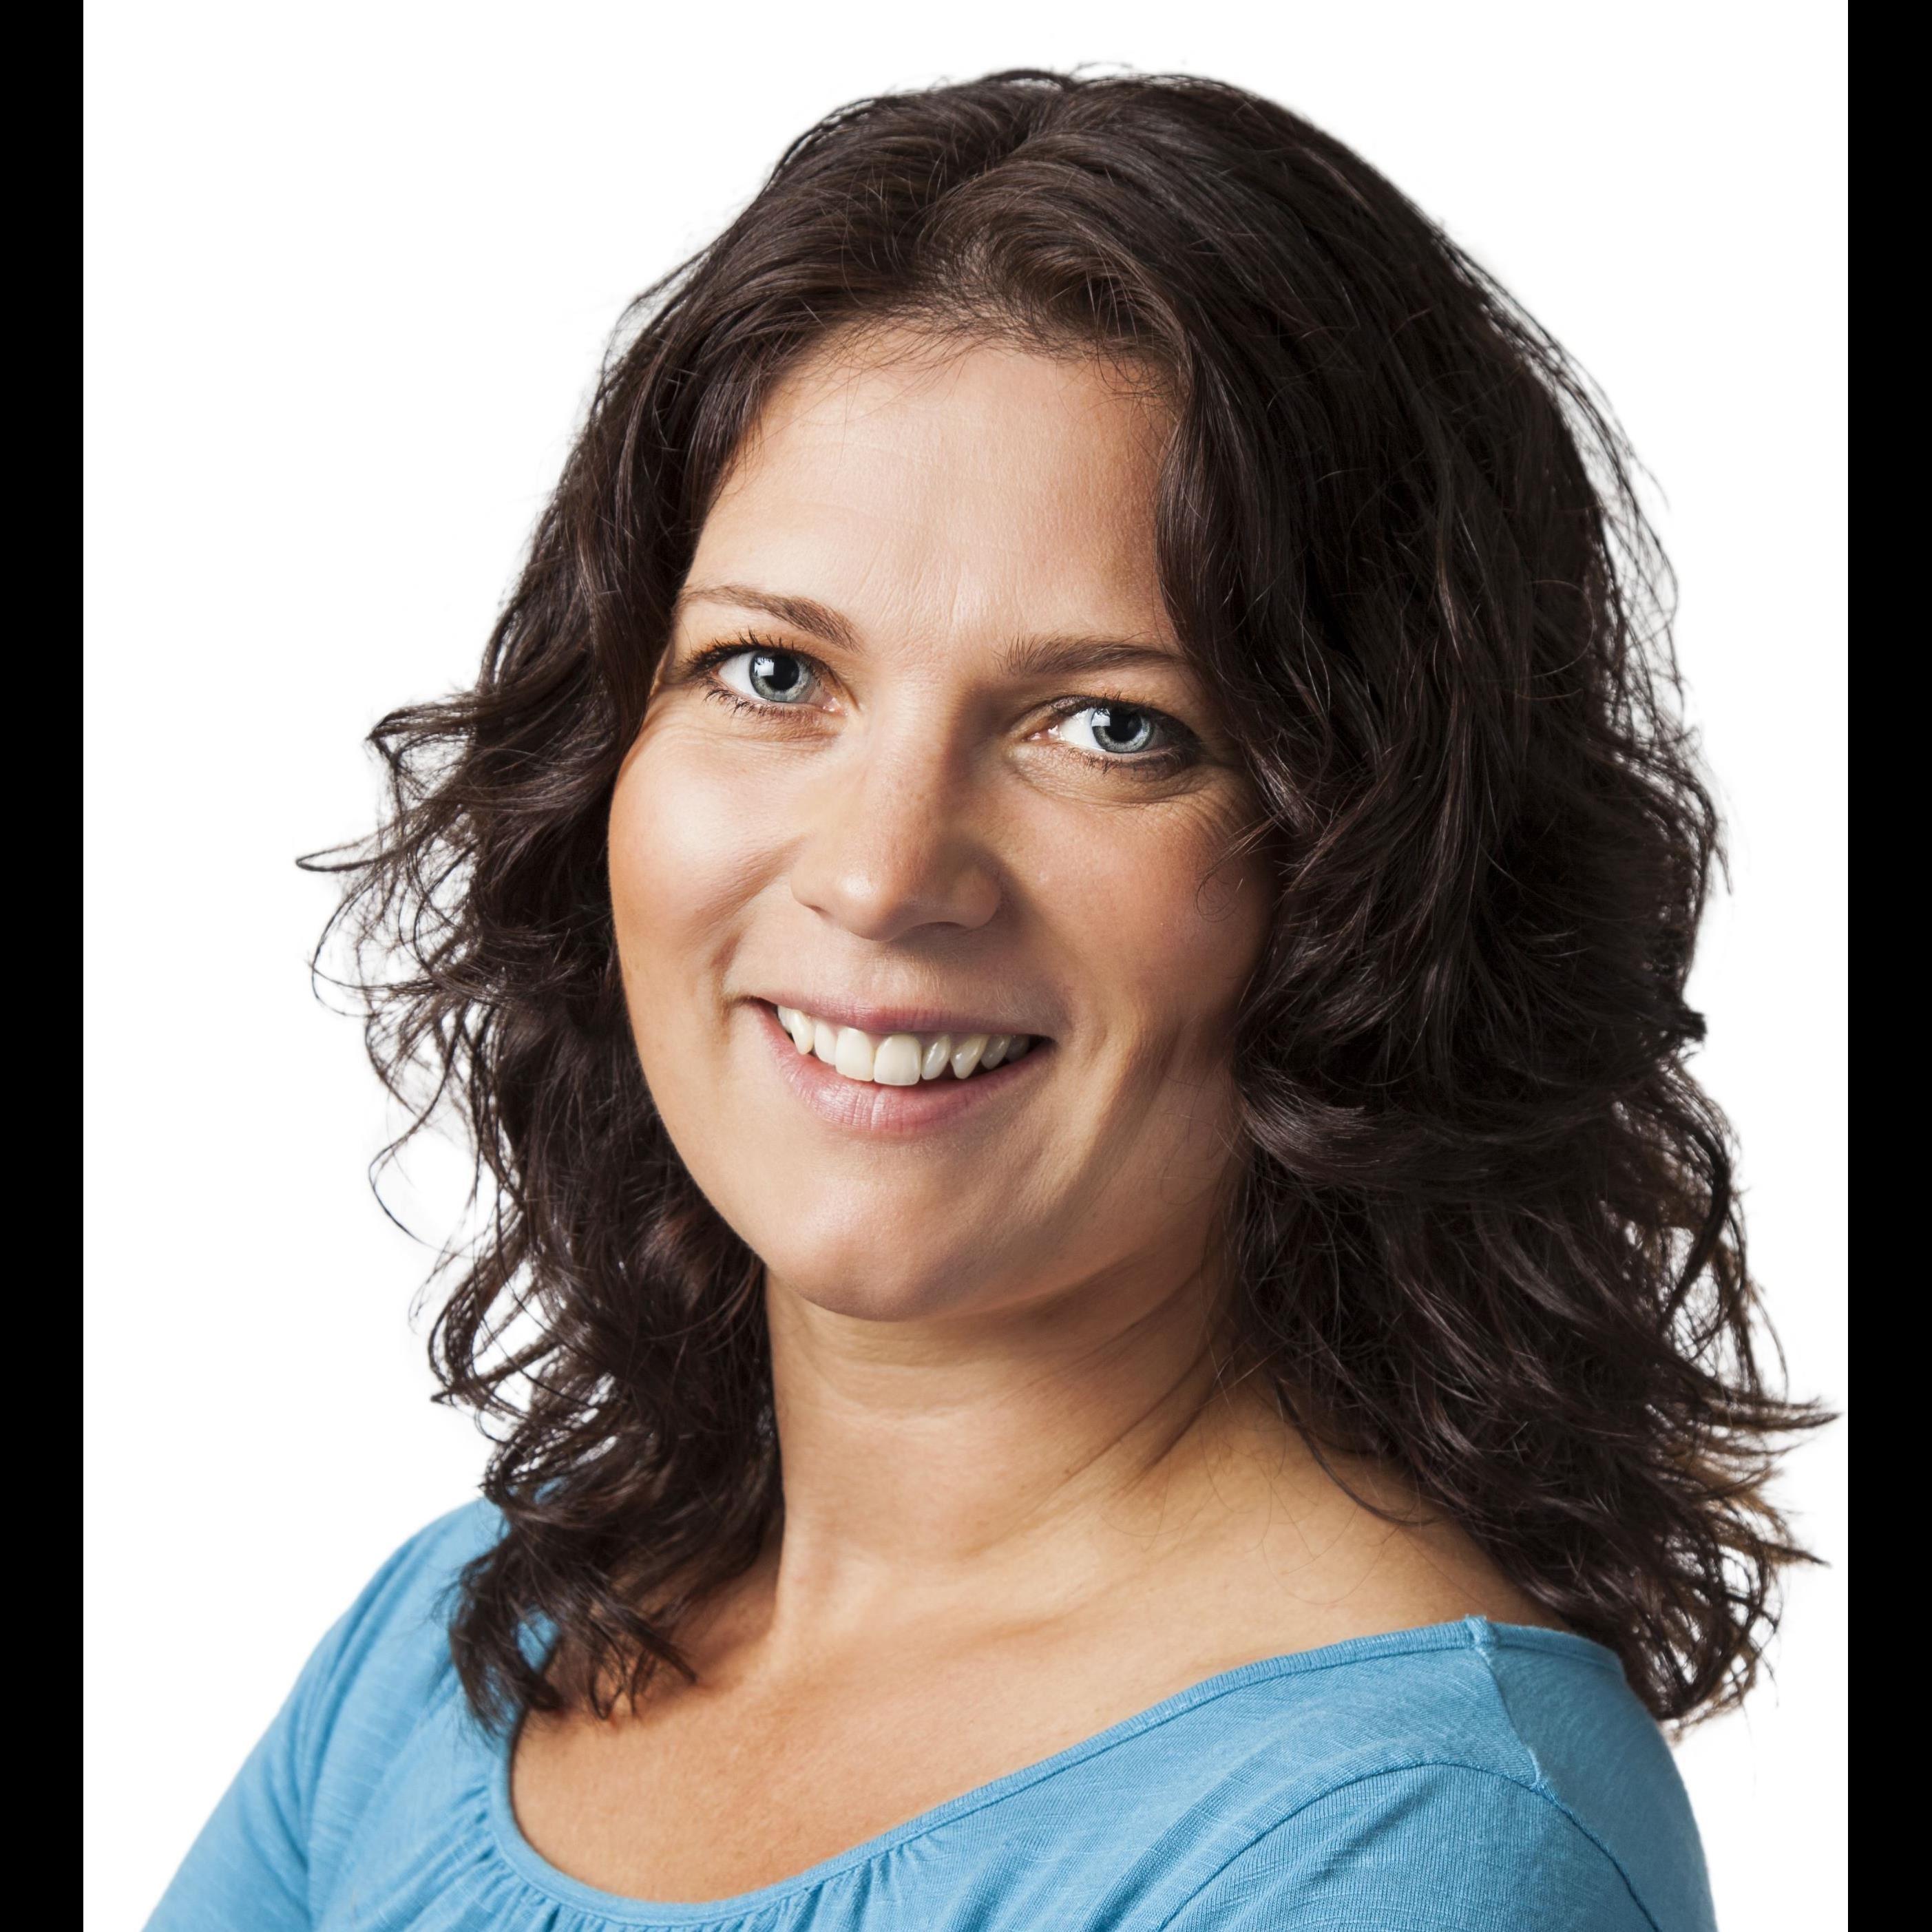 Anette Lund